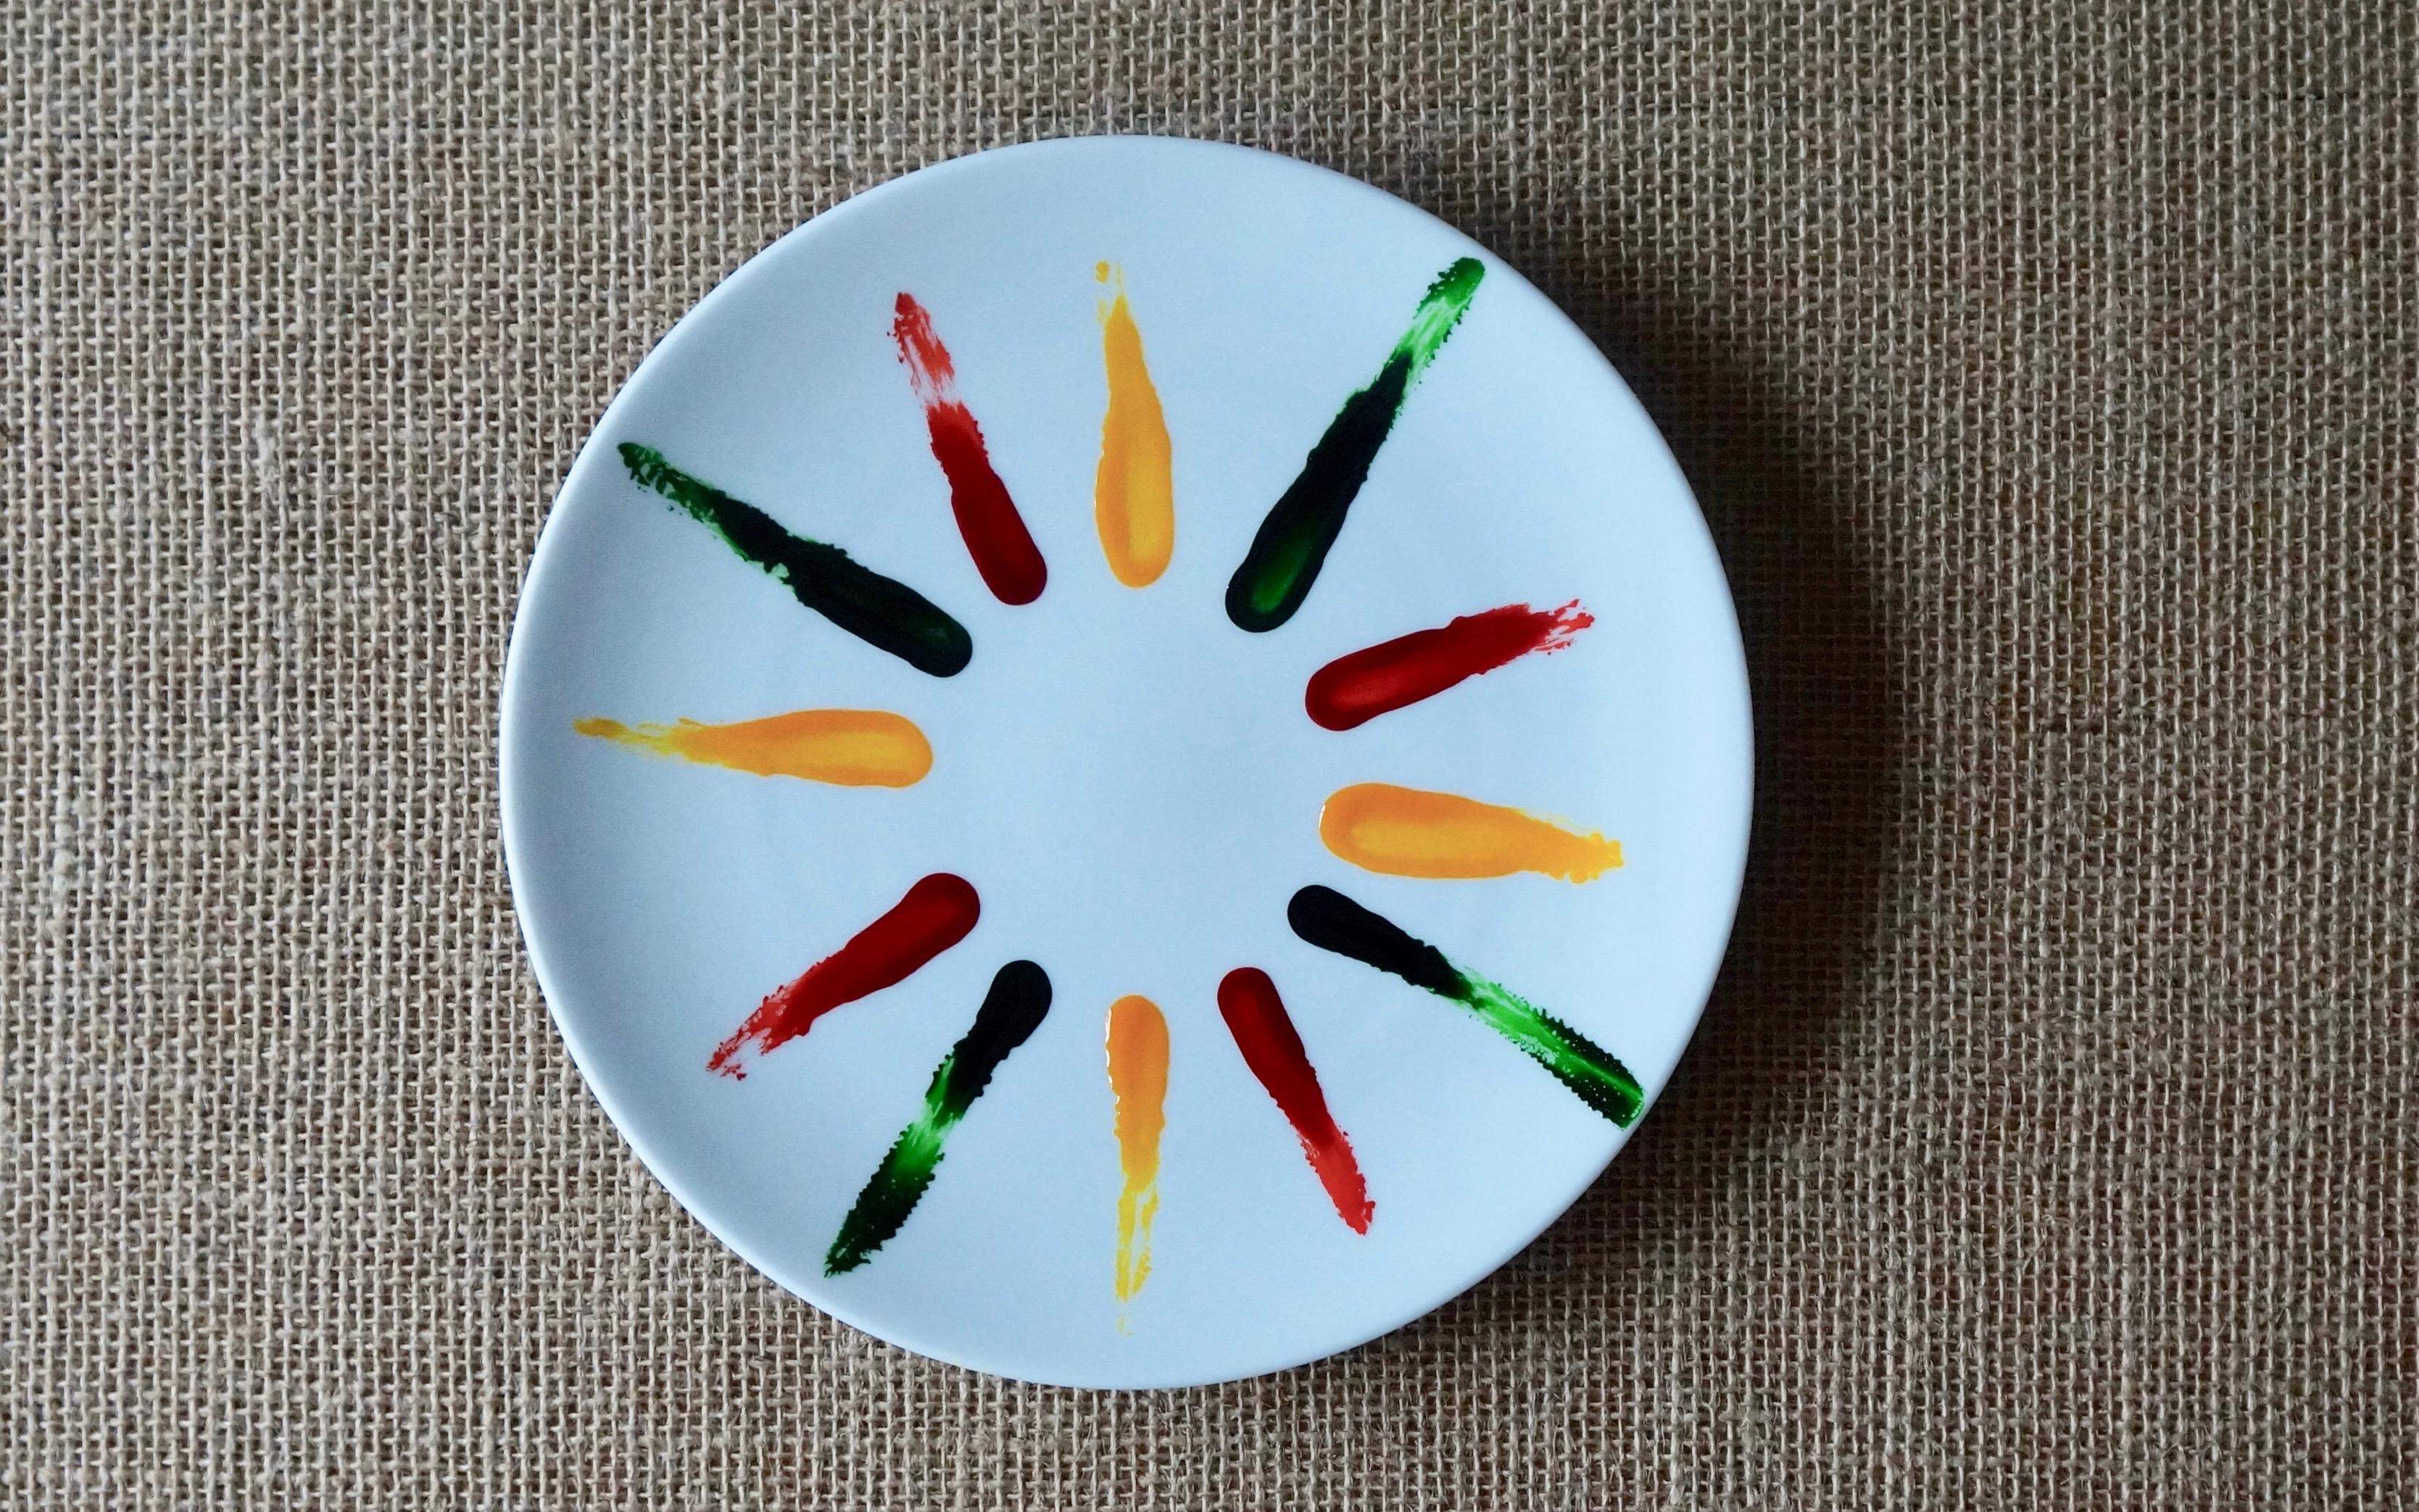 Food-Coloring-Paste-Rebecca-Gordon-Editor-In-Chief-Buttermilk-Lipstick-Culinary-Entertaining-Techniques-Christmas-Cookies-RebeccaGordon-Pastry-Chef-Birmingham-Alabama